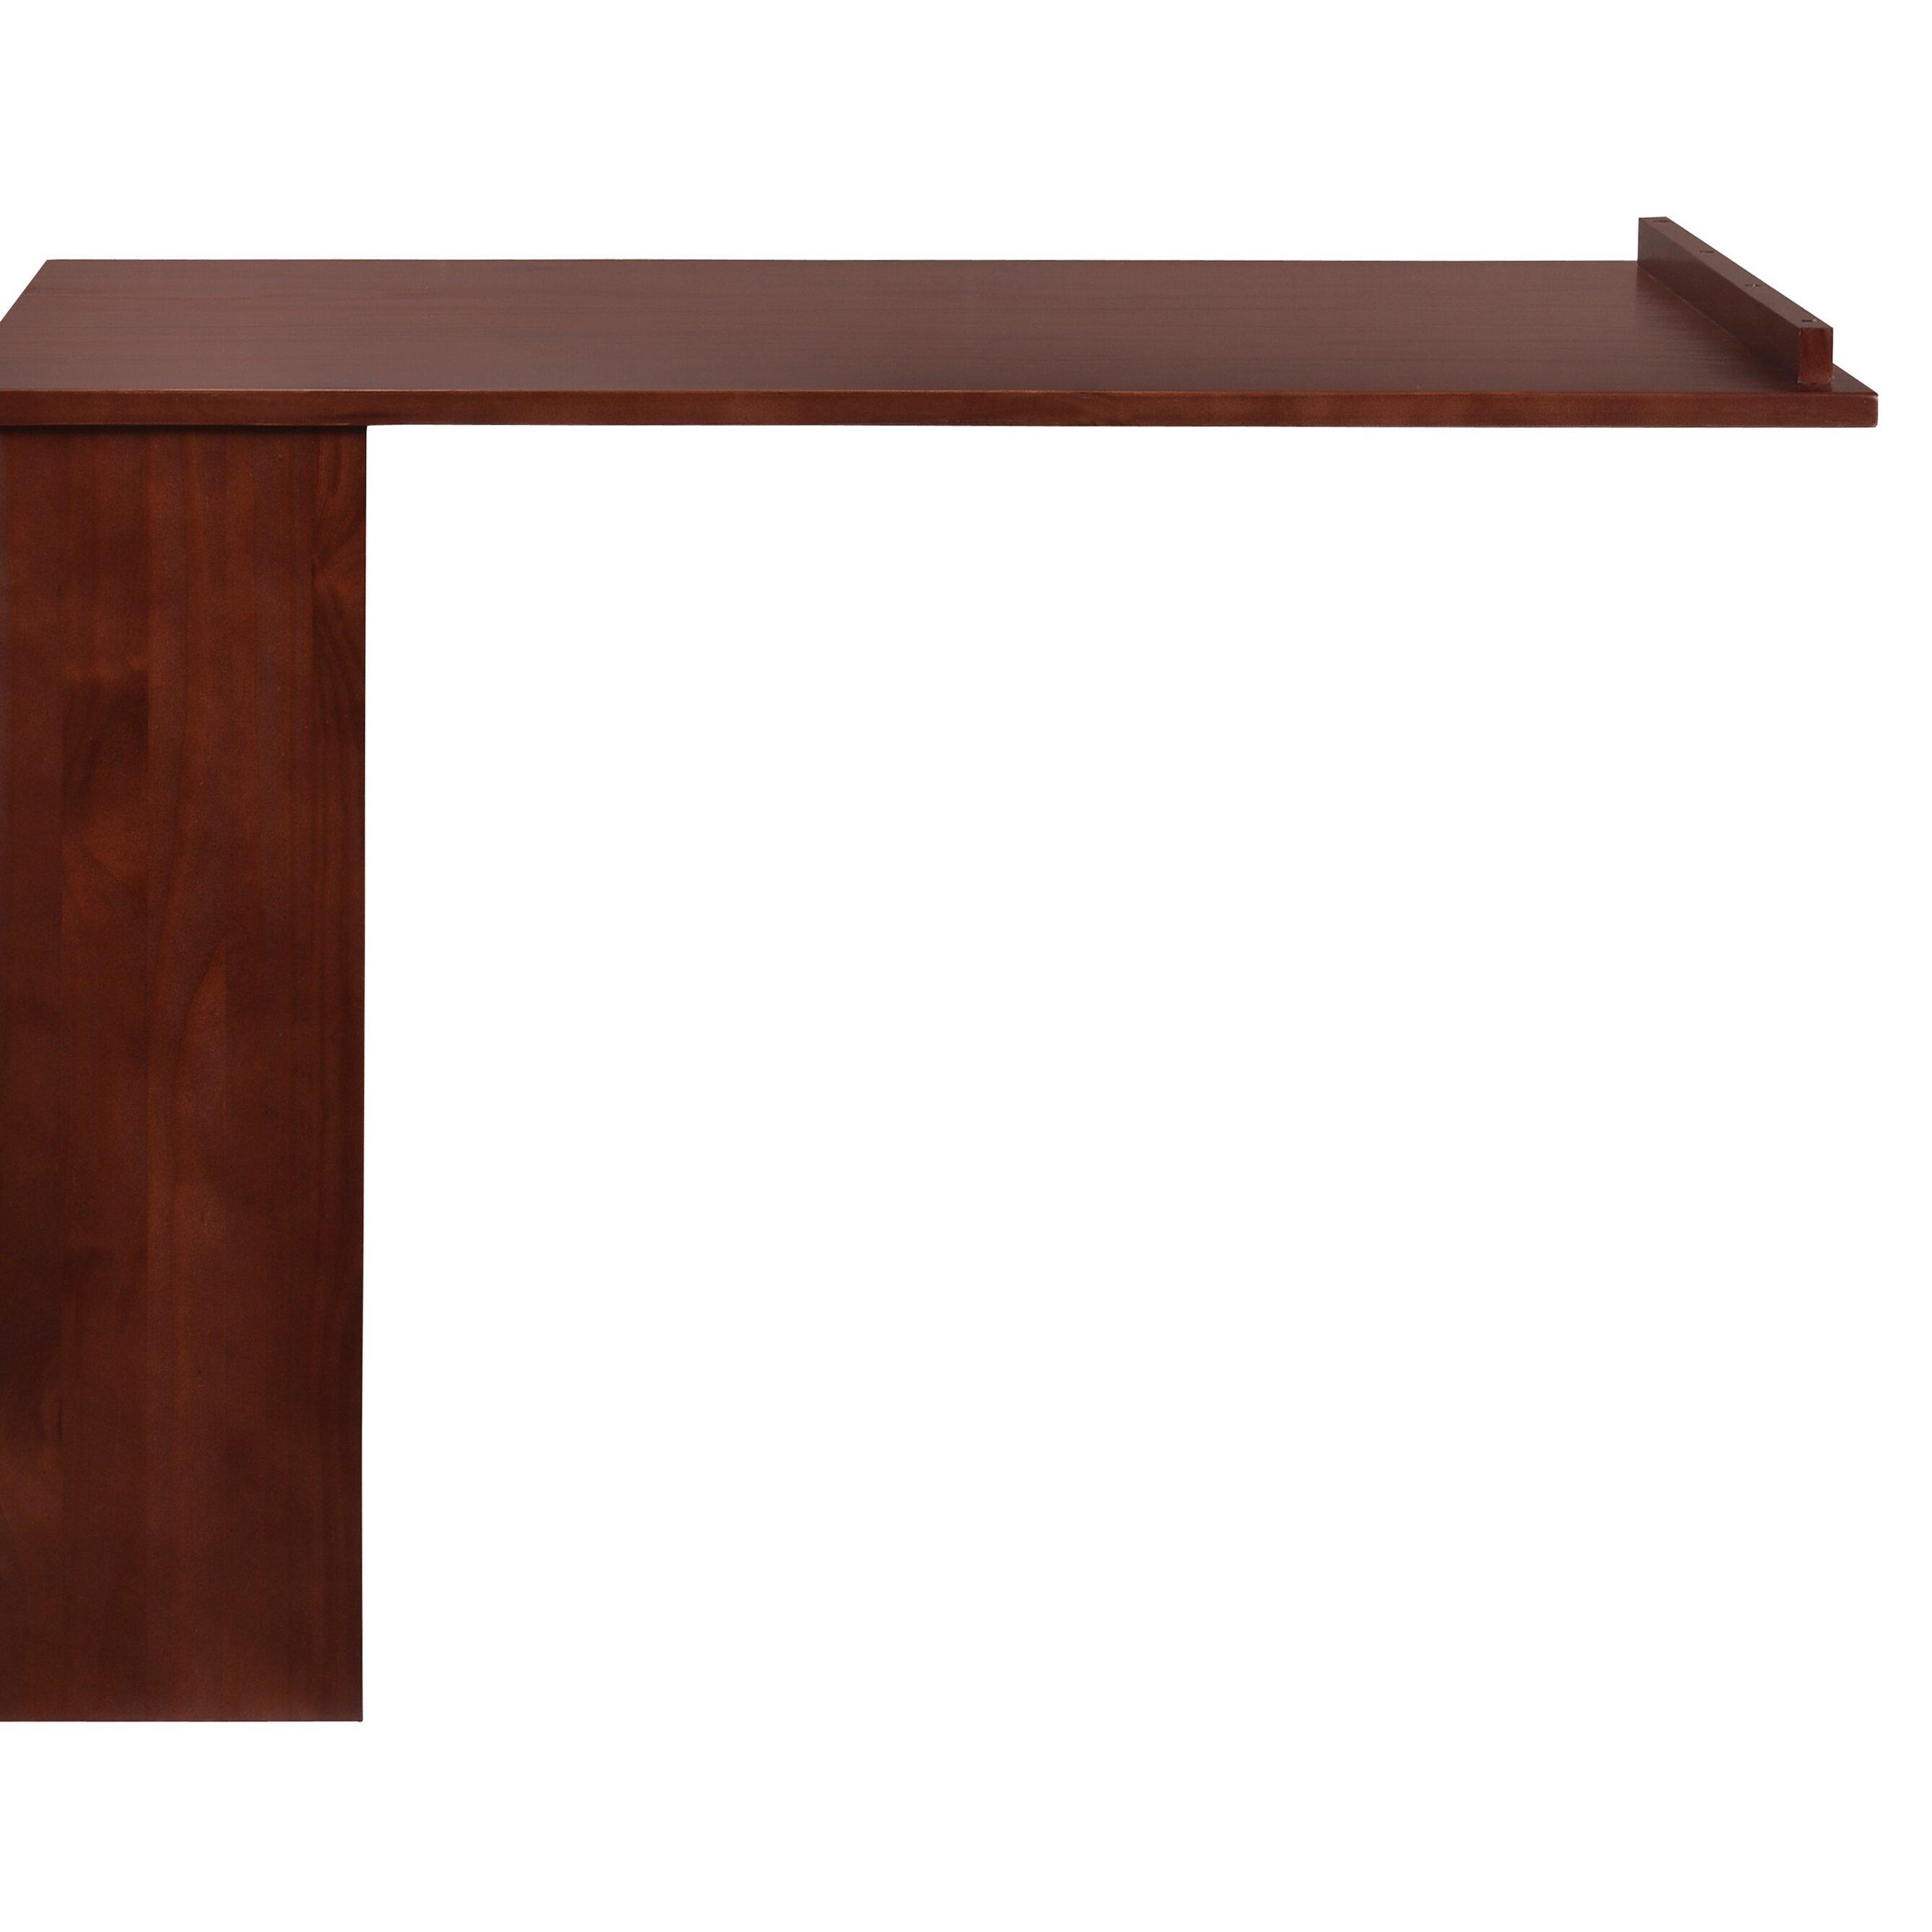 Canwood furniture whistler junior slide out desk reviews wayfair - Canwood whistler ...